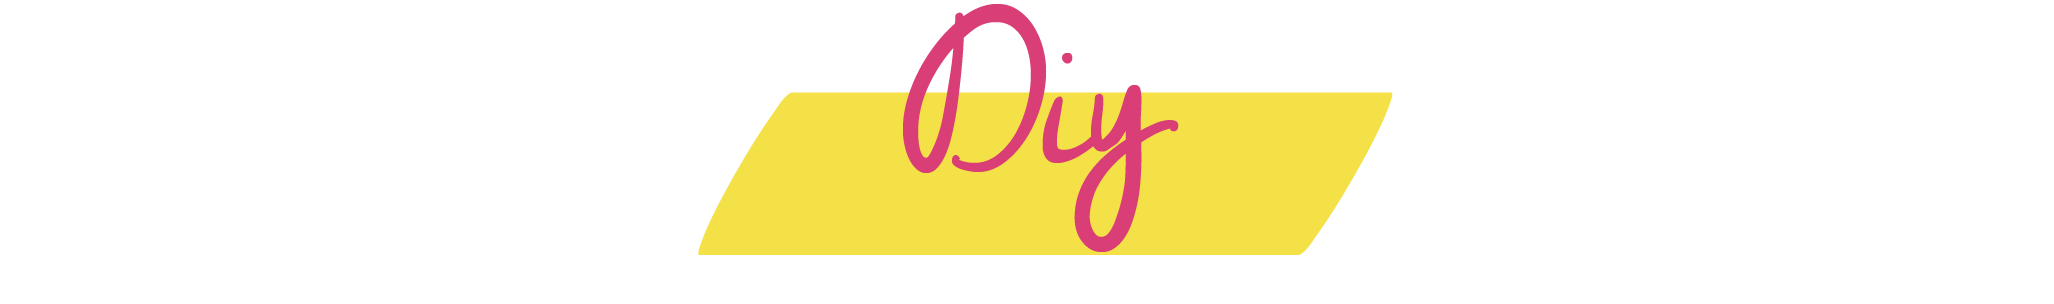 Anna Osgoodby Life + Biz :: DIY blog posts